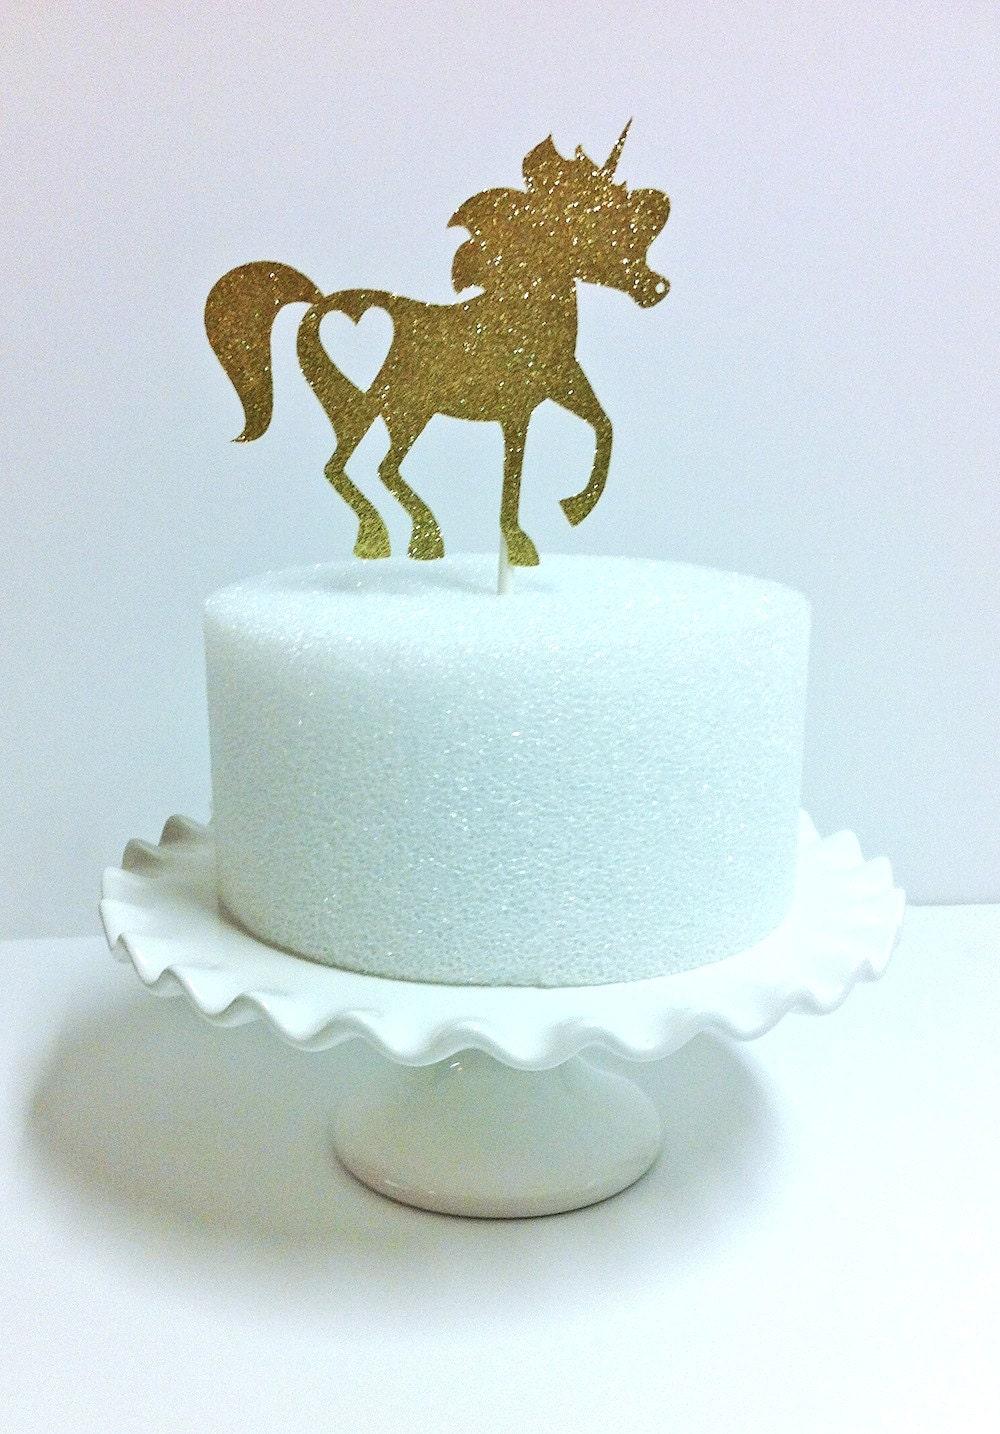 Etsy Cake Decor : Gold Unicorn Cake Topper Centerpiece